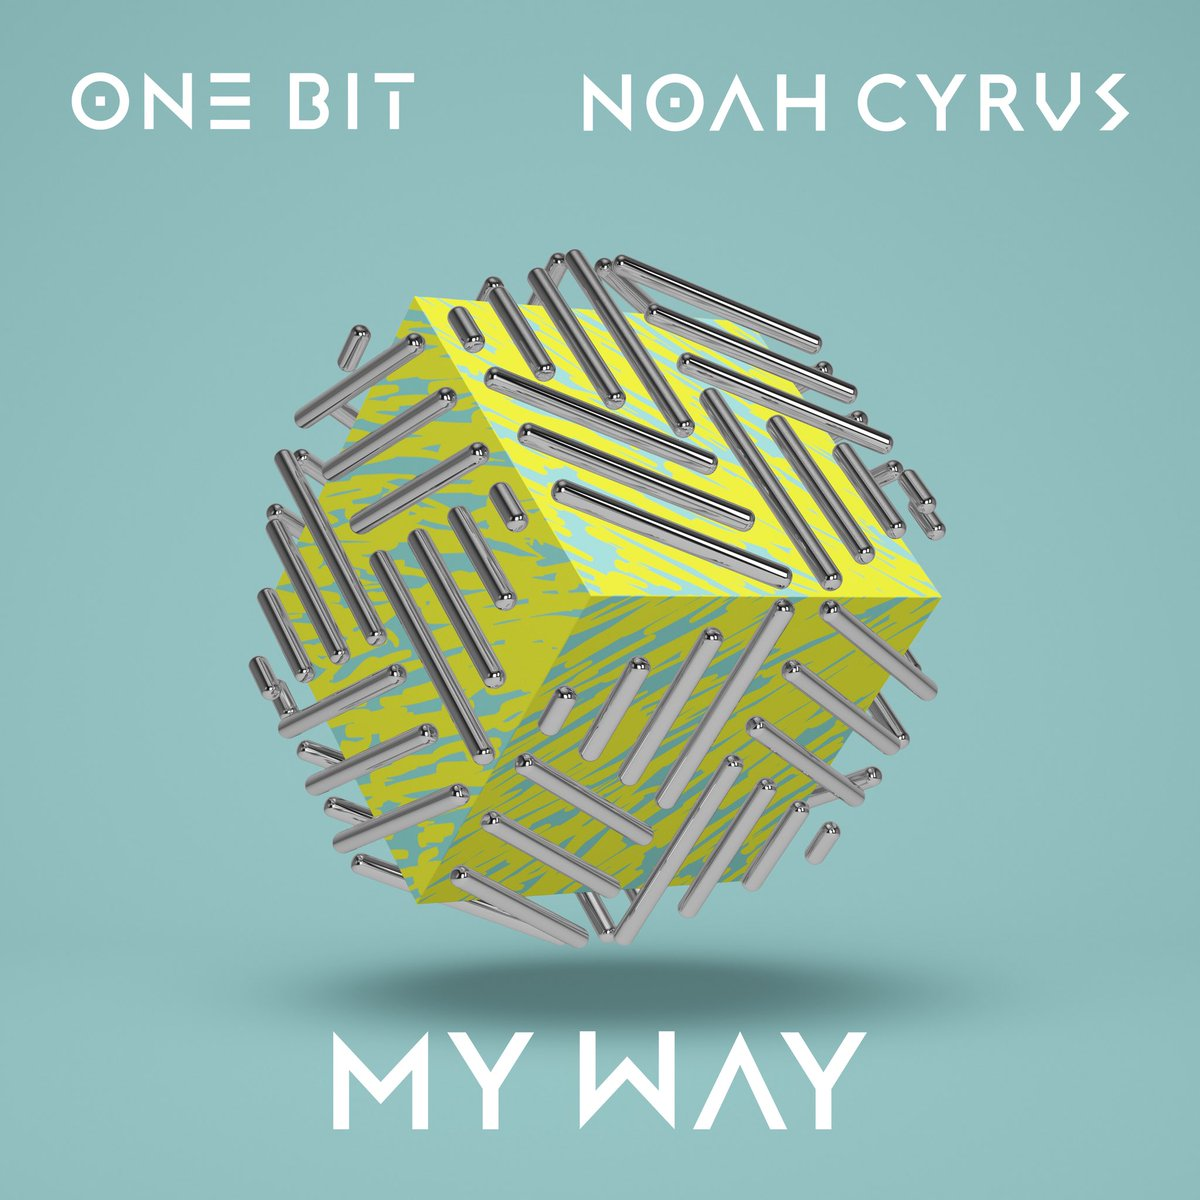 One Bit feat. Noah Cyrus - My Way